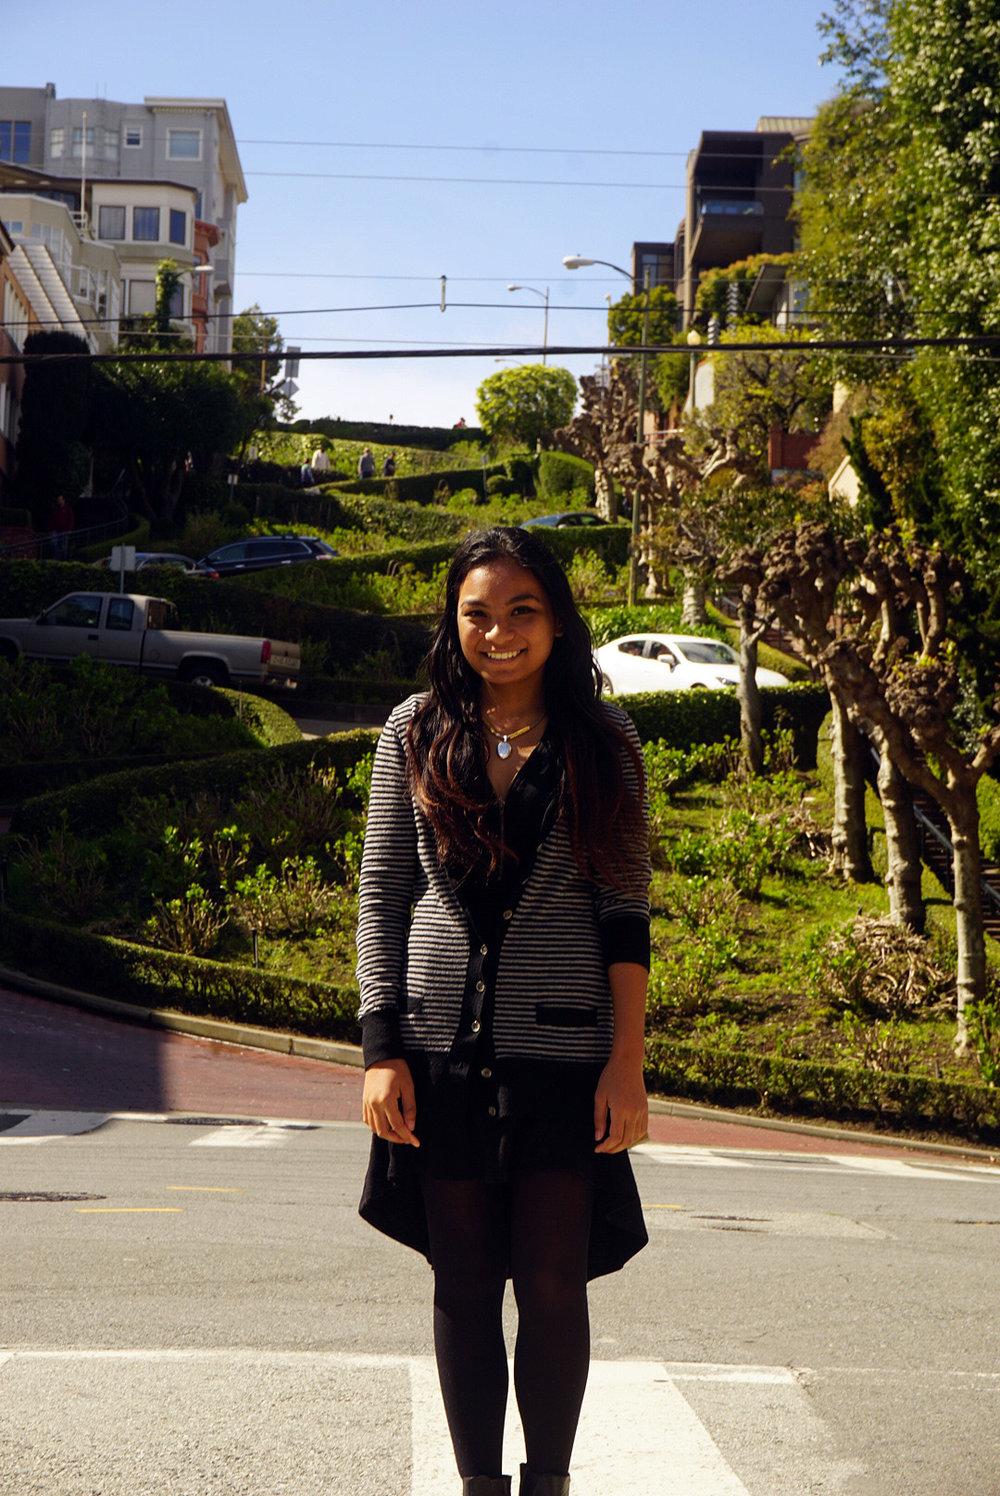 Zipper-Dresses-Striped-Cardigans-High-Low-Dress-Fashionista-Blogger-Style-LINDATENCHITRAN-2-1080x1616.jpg